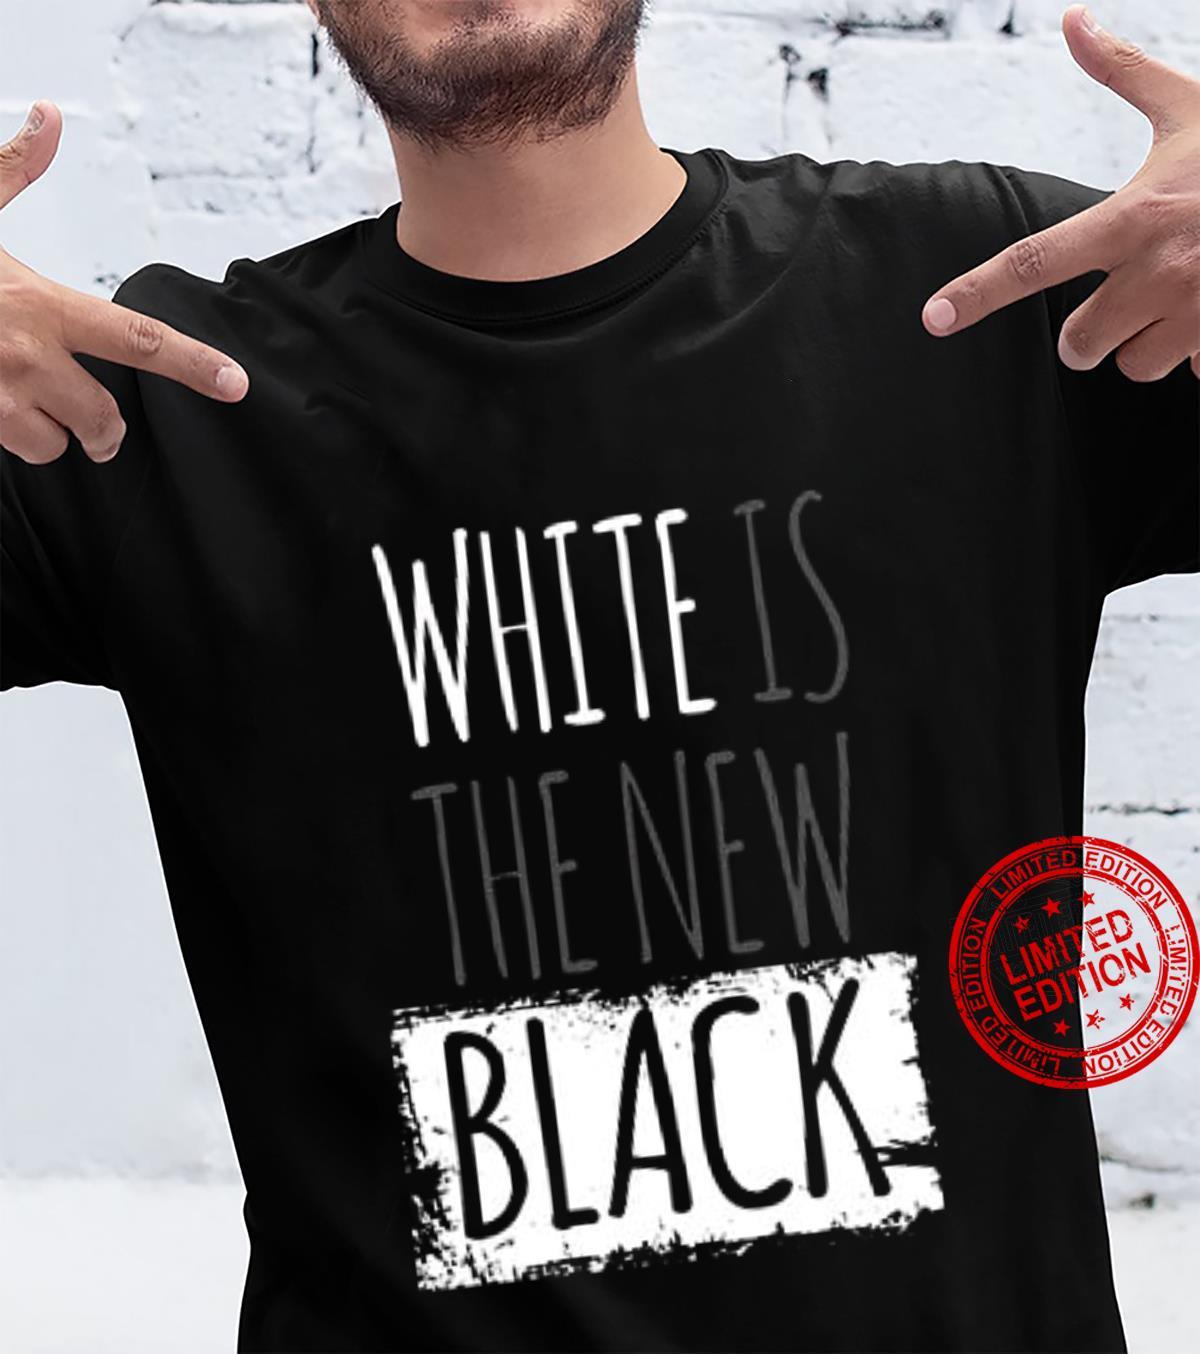 White Is The New Black Shirt unisex